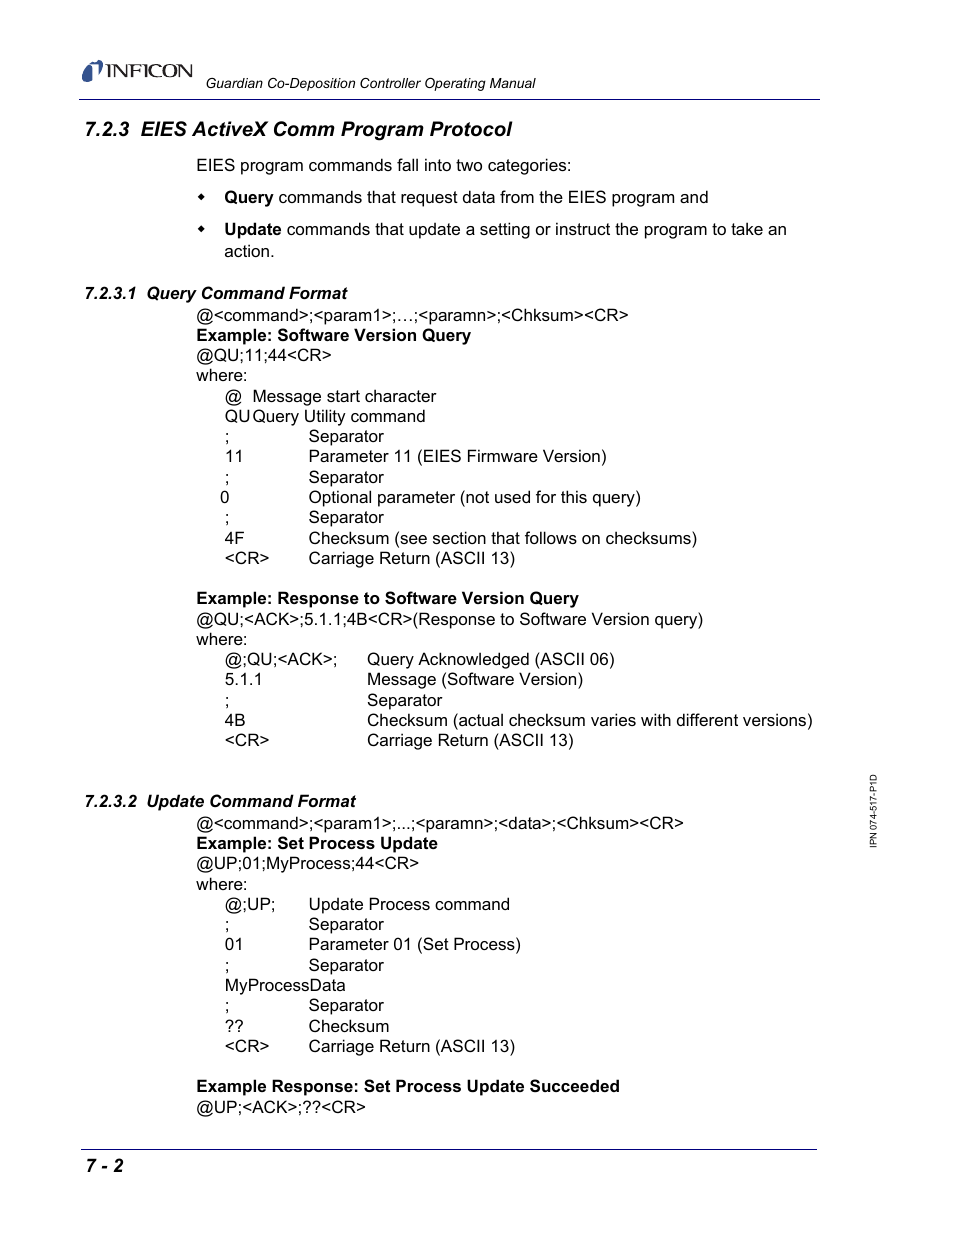 3 eies activex comm program protocol, 1 query command format, 2